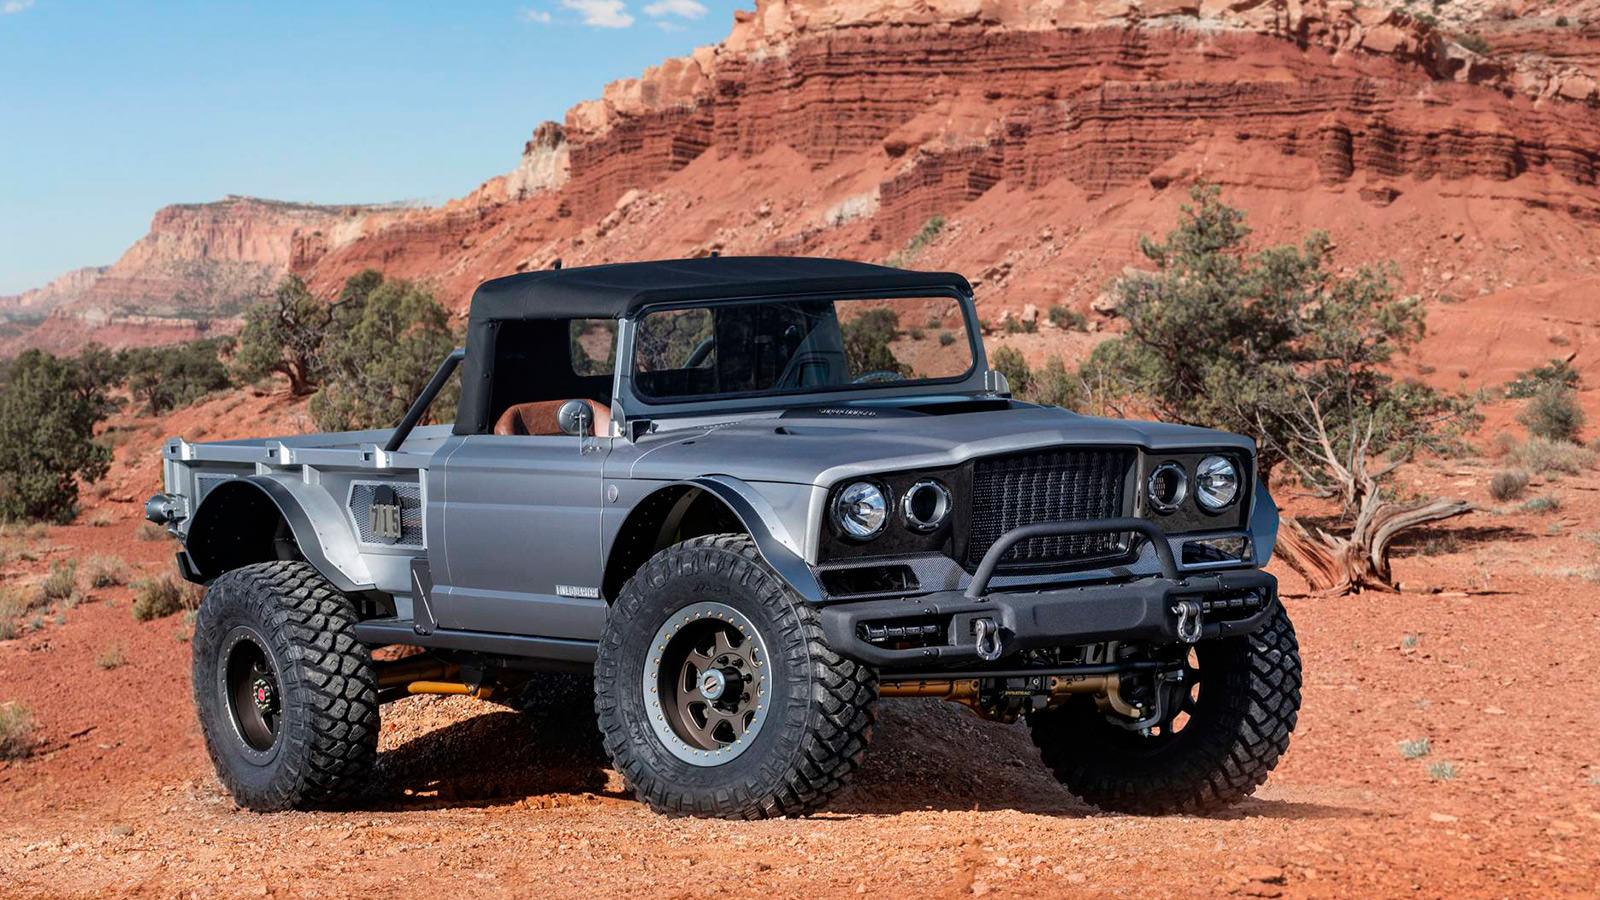 Jeep M-715 Five-Quarter